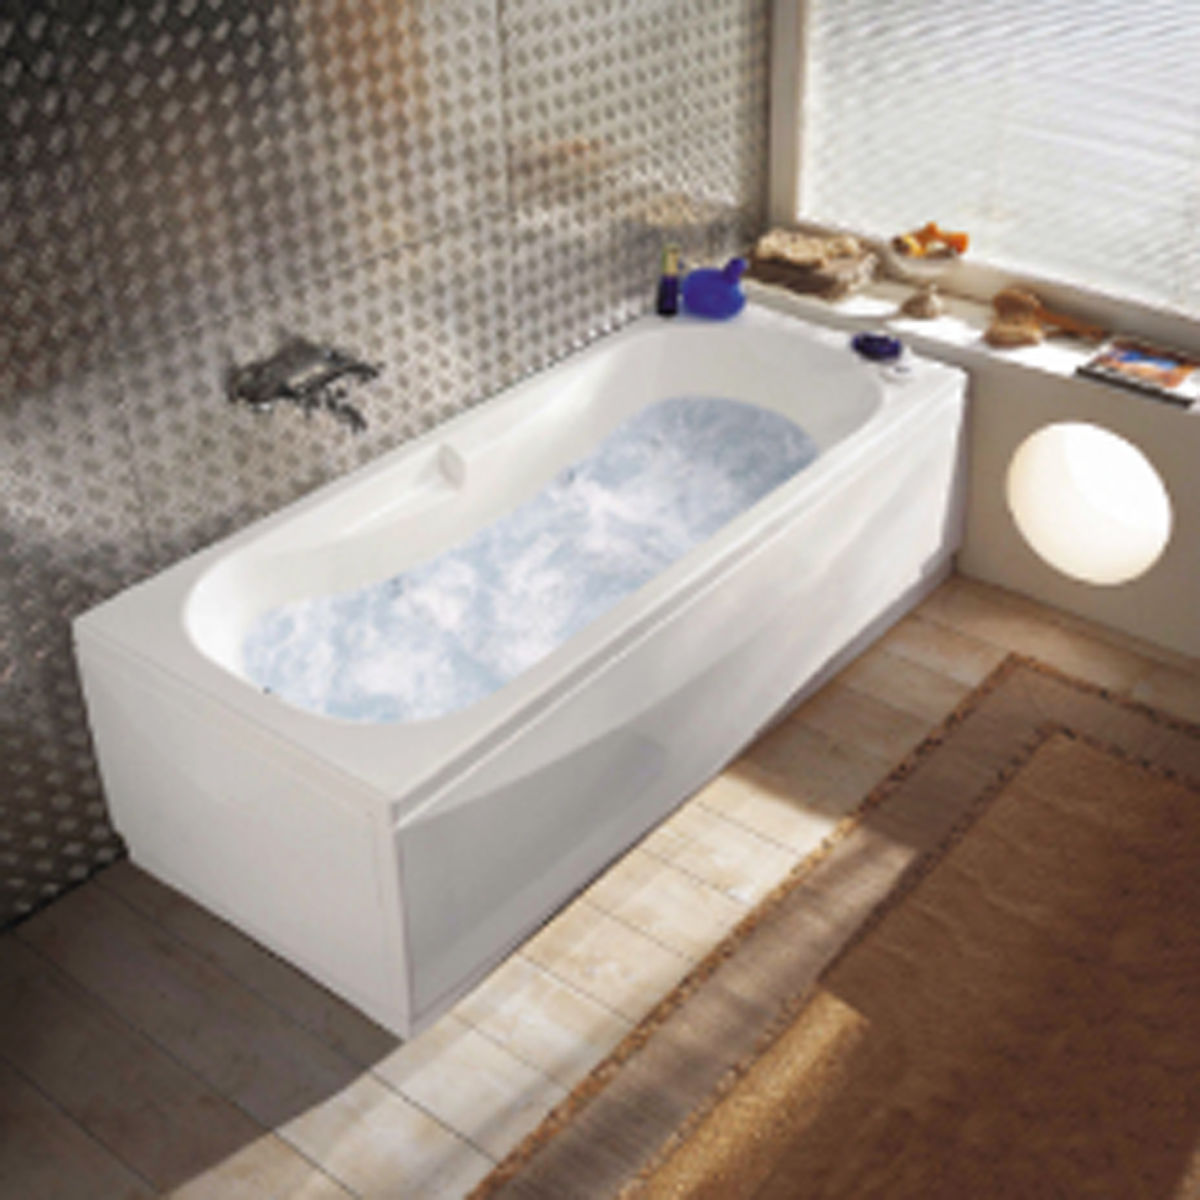 Vasca idromassaggio esterno leroy merlin cs39 - Copertura vasca da bagno prezzi ...